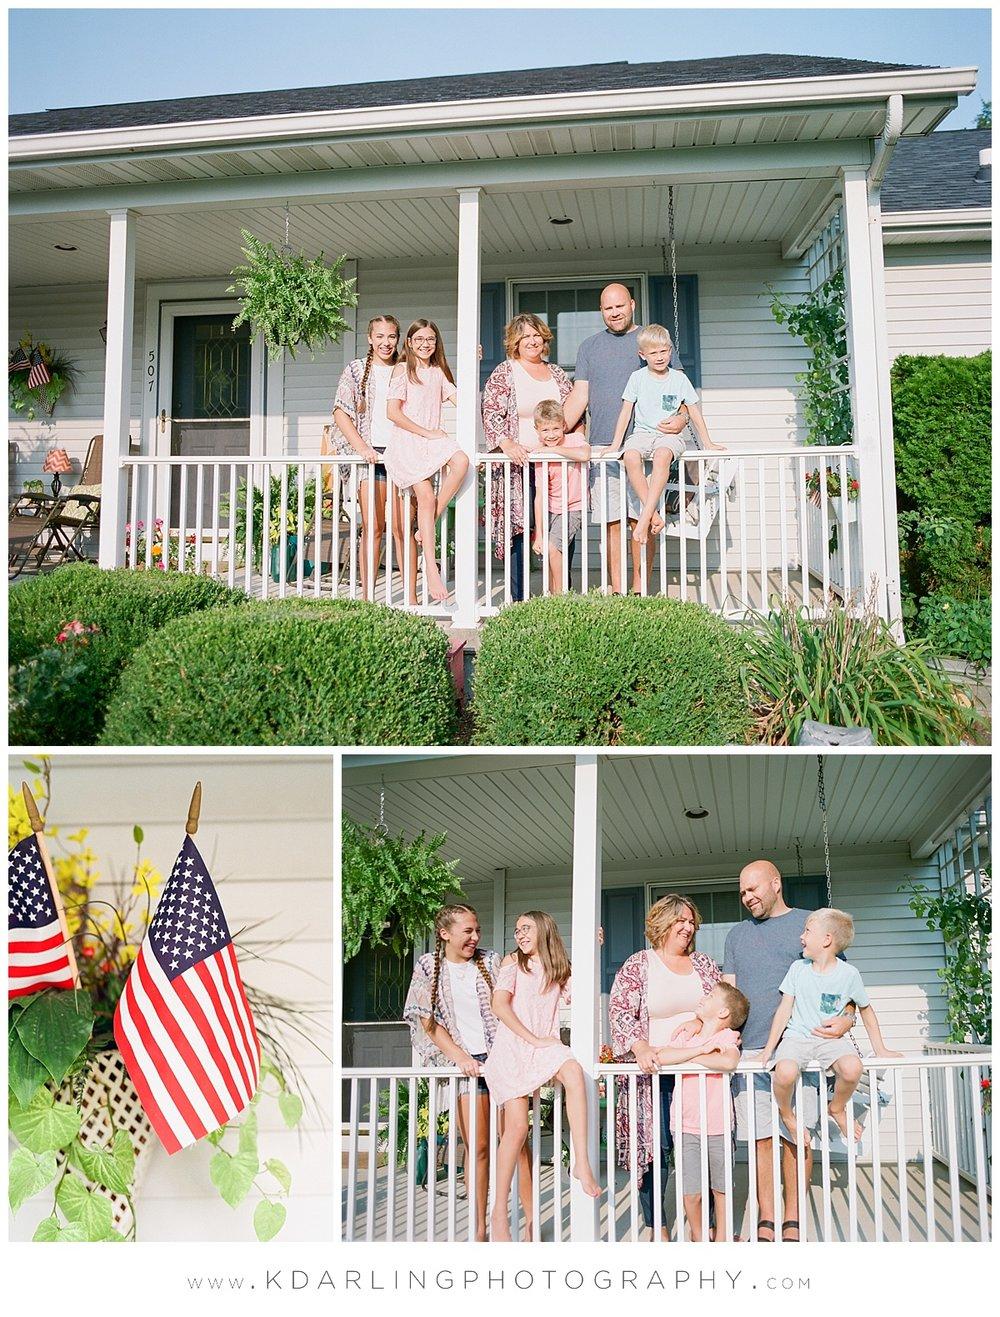 Central-illinois-Photographer-family-film-photography-Cissna-Park-mamiya-fuji-front-porch-session_0422.jpg